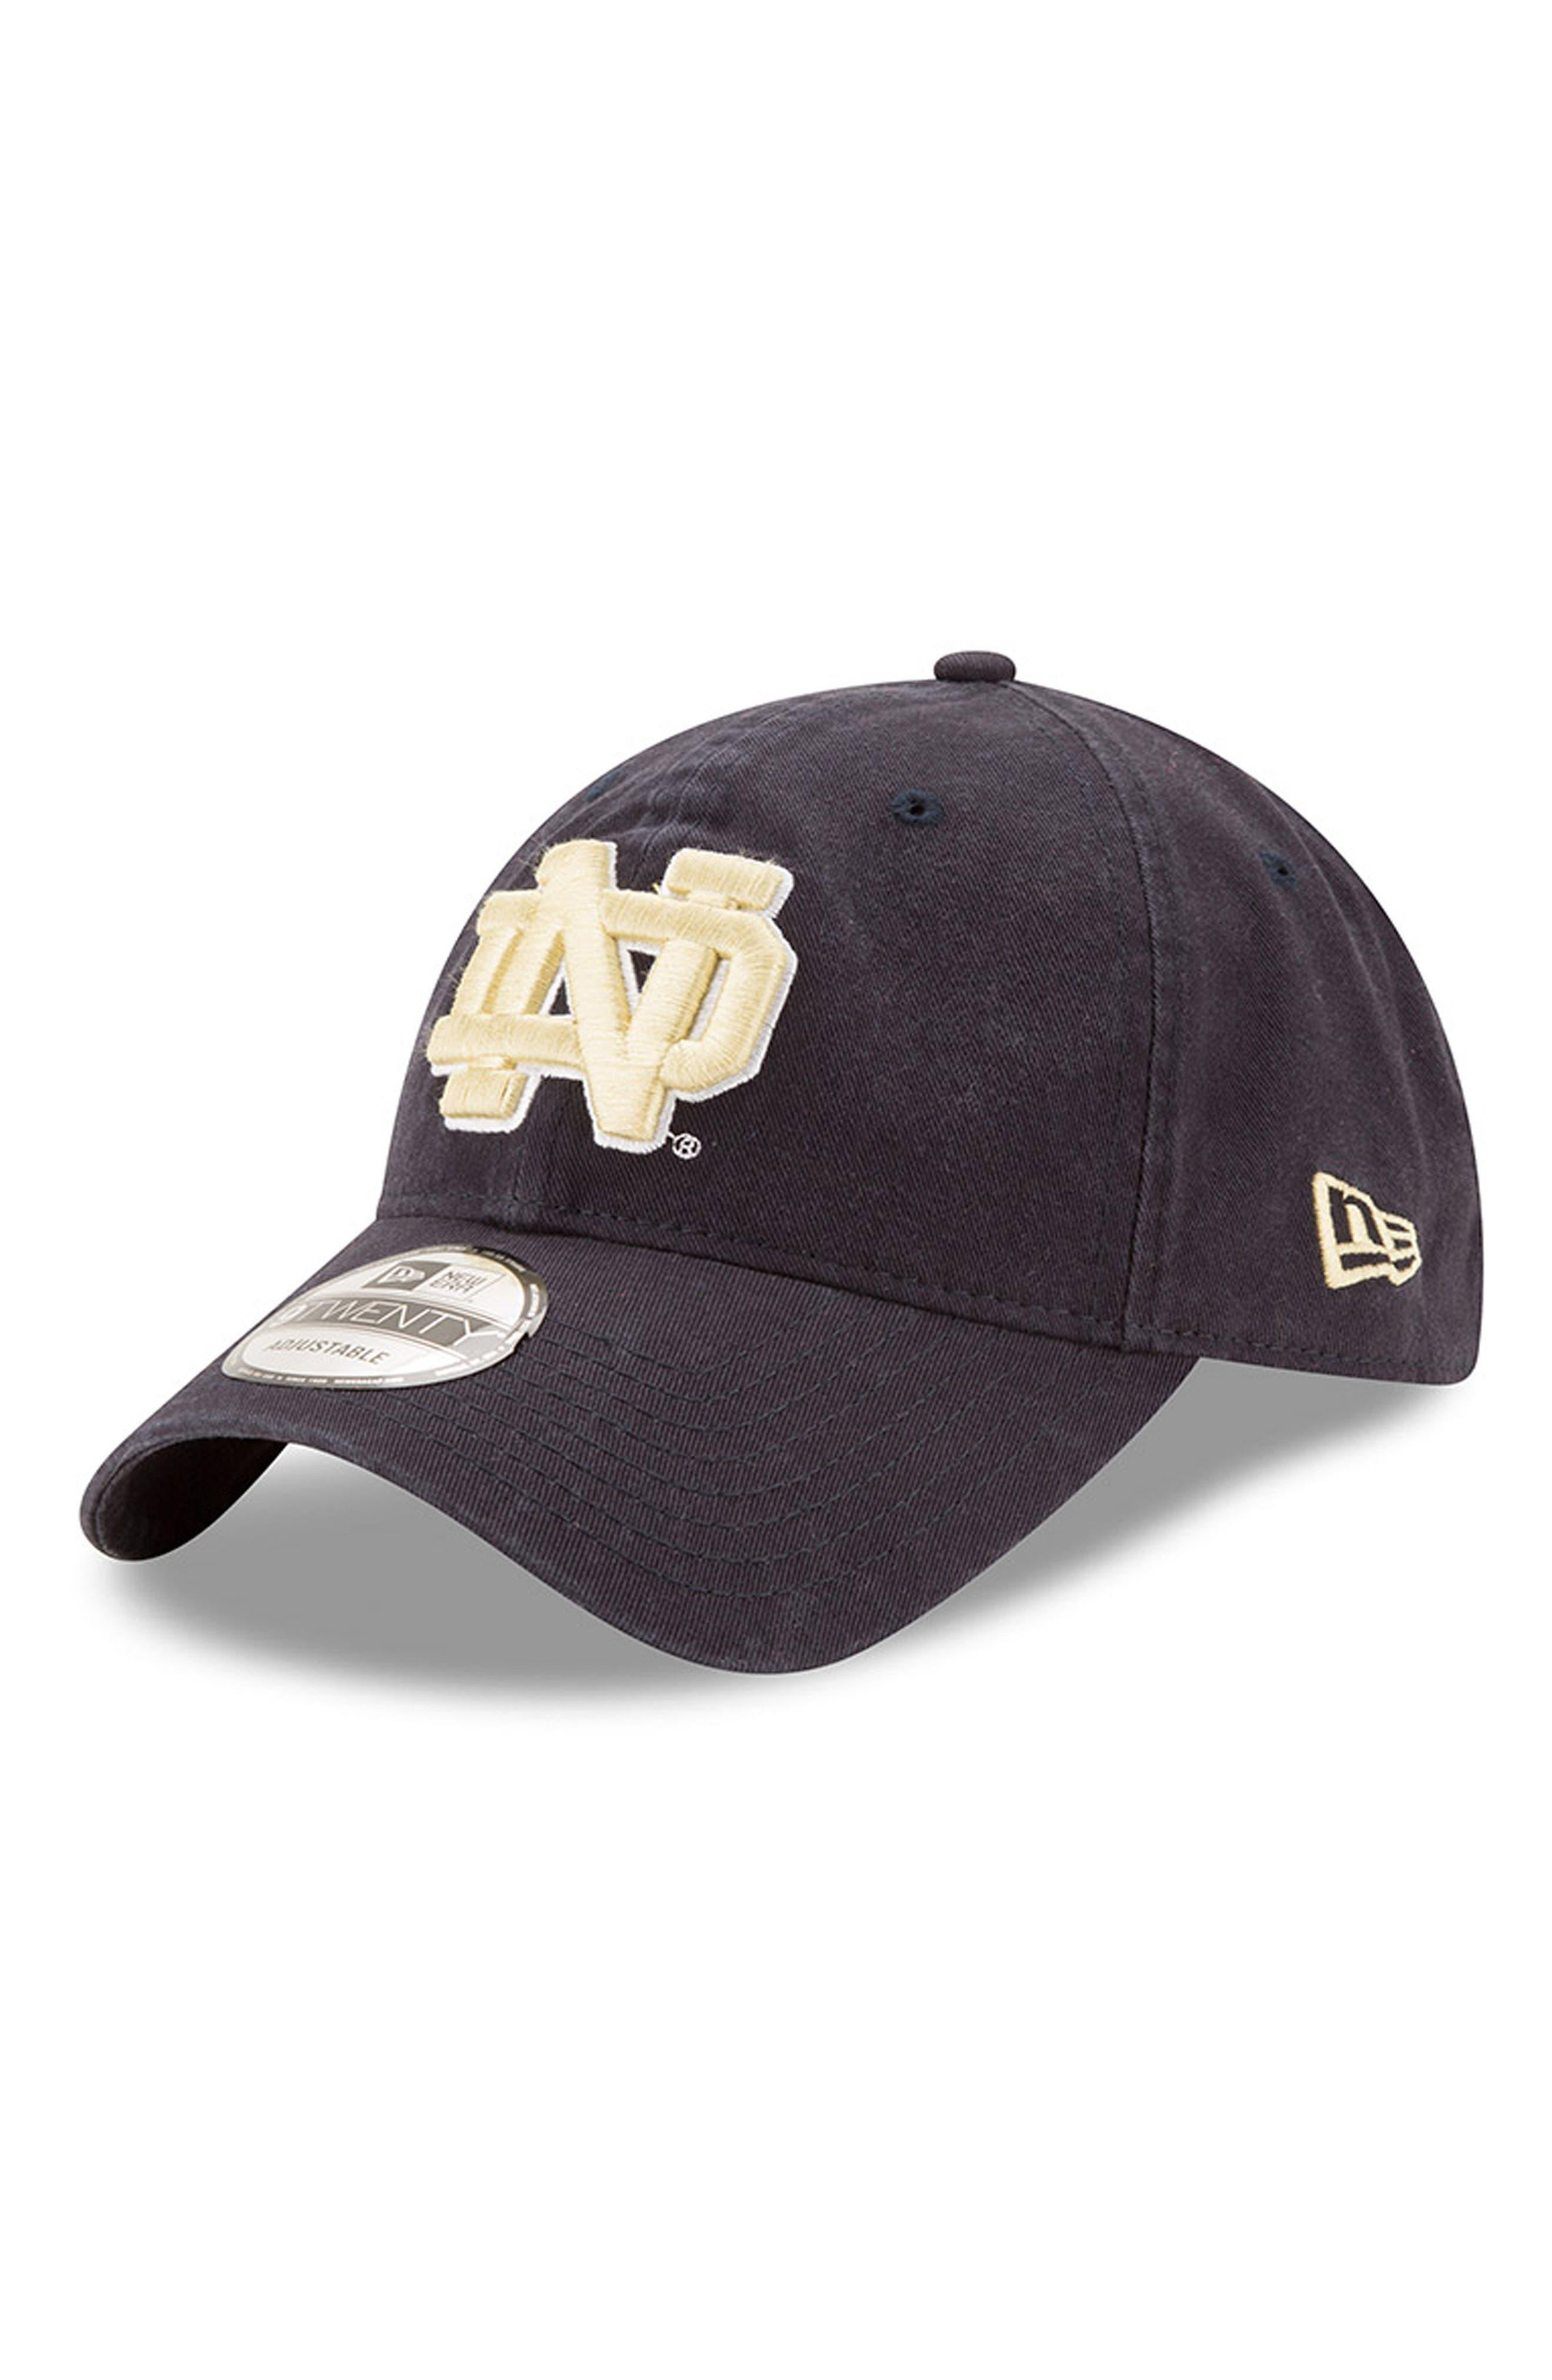 New Era Collegiate Core Classic - Notre Dame Fighting Irish Baseball Cap